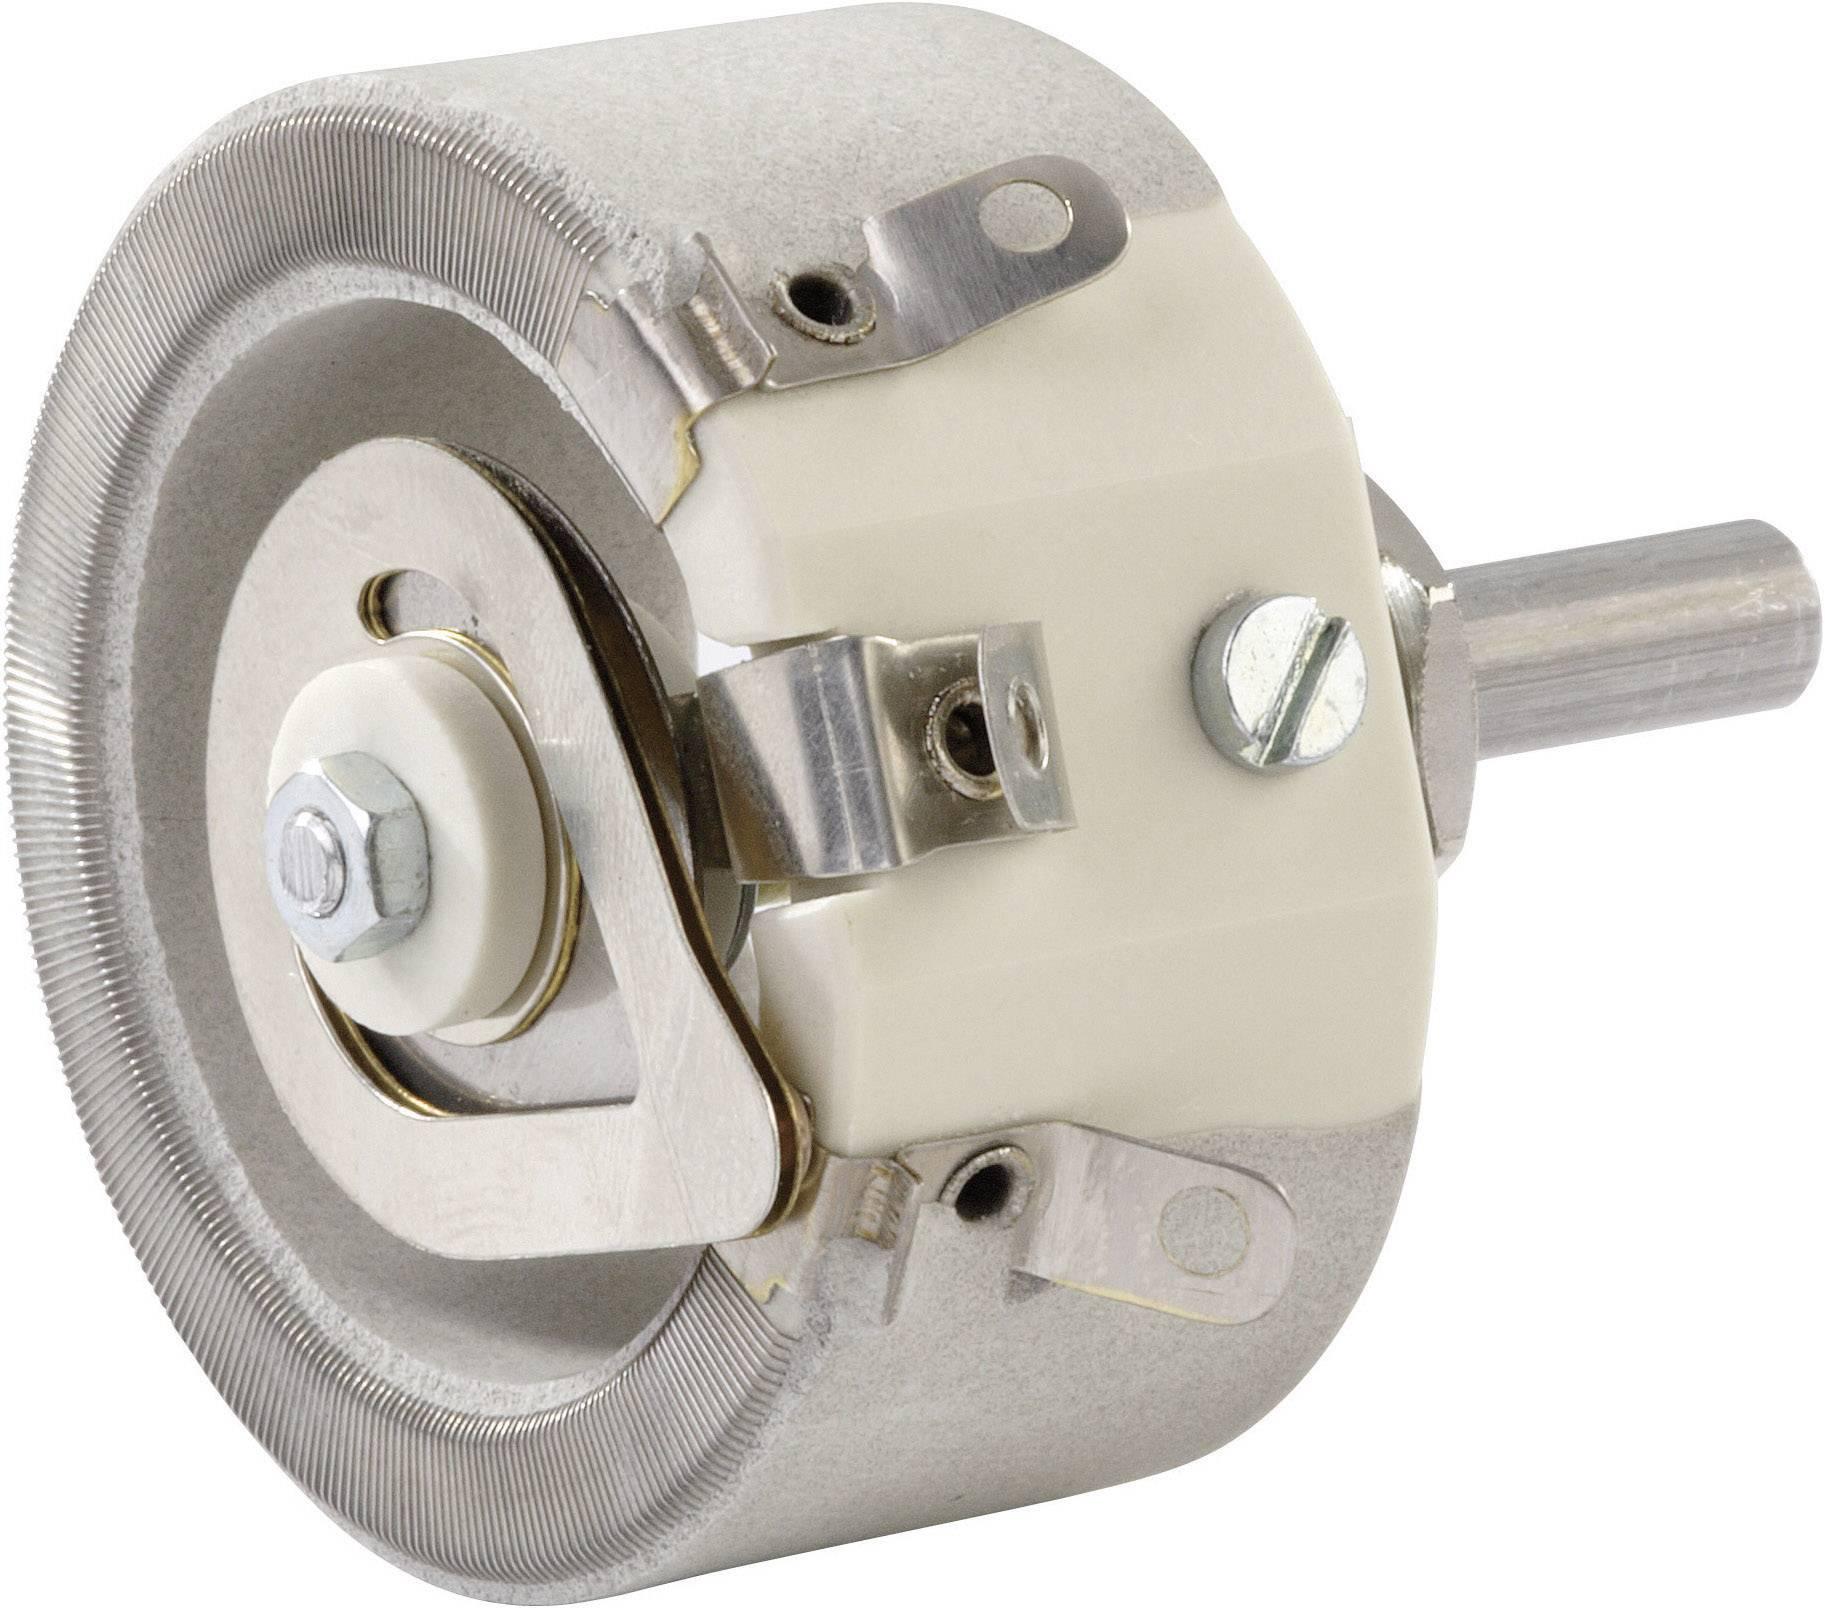 Drôtový potenciometer mono TT Electronics AB 3191106950 3191106950, 30 W, 8.2 kOhm, 1 ks